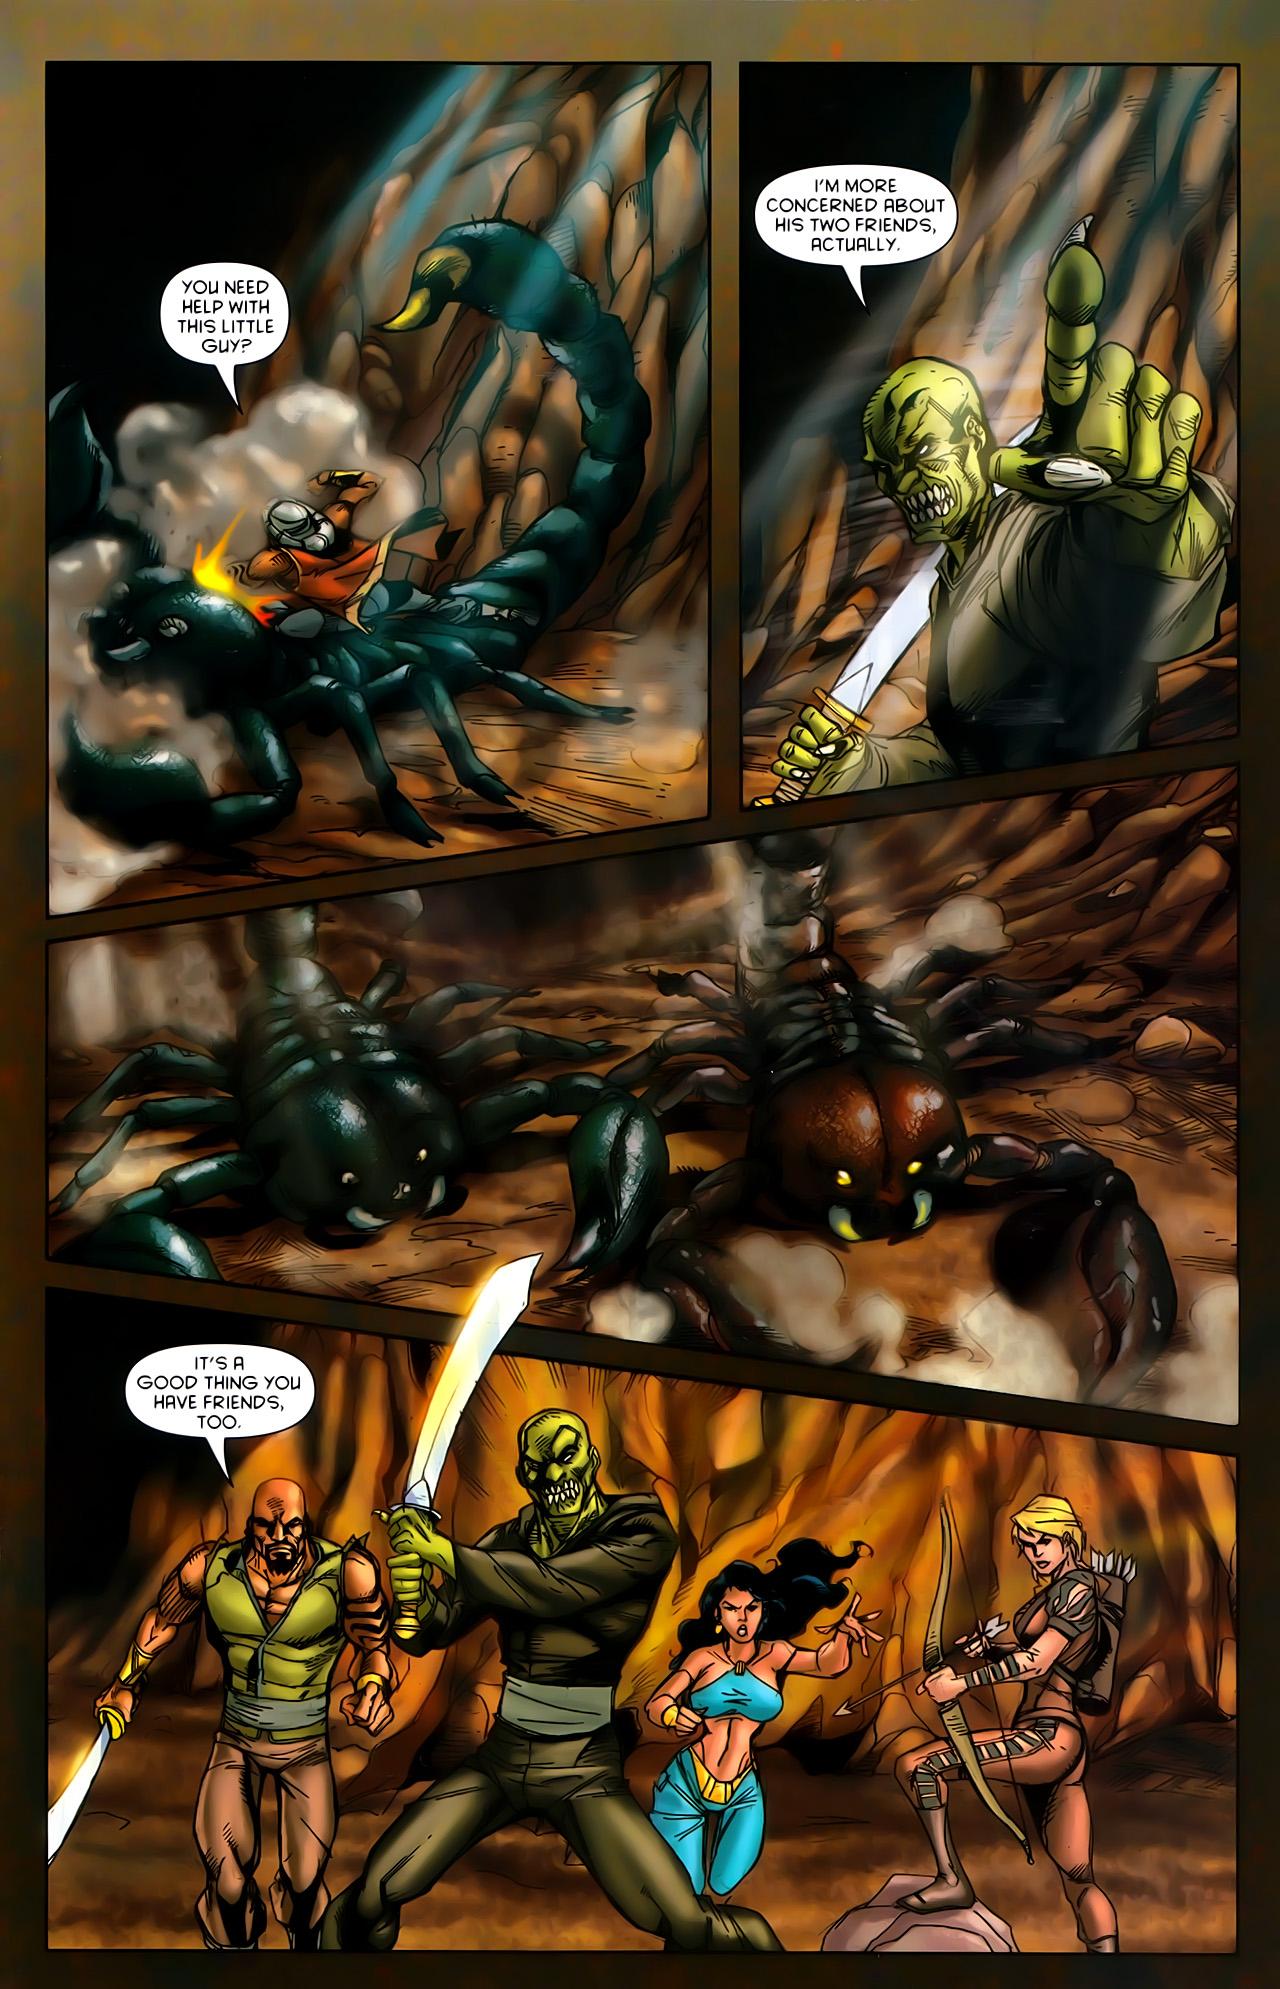 Read online 1001 Arabian Nights: The Adventures of Sinbad comic -  Issue #10 - 17